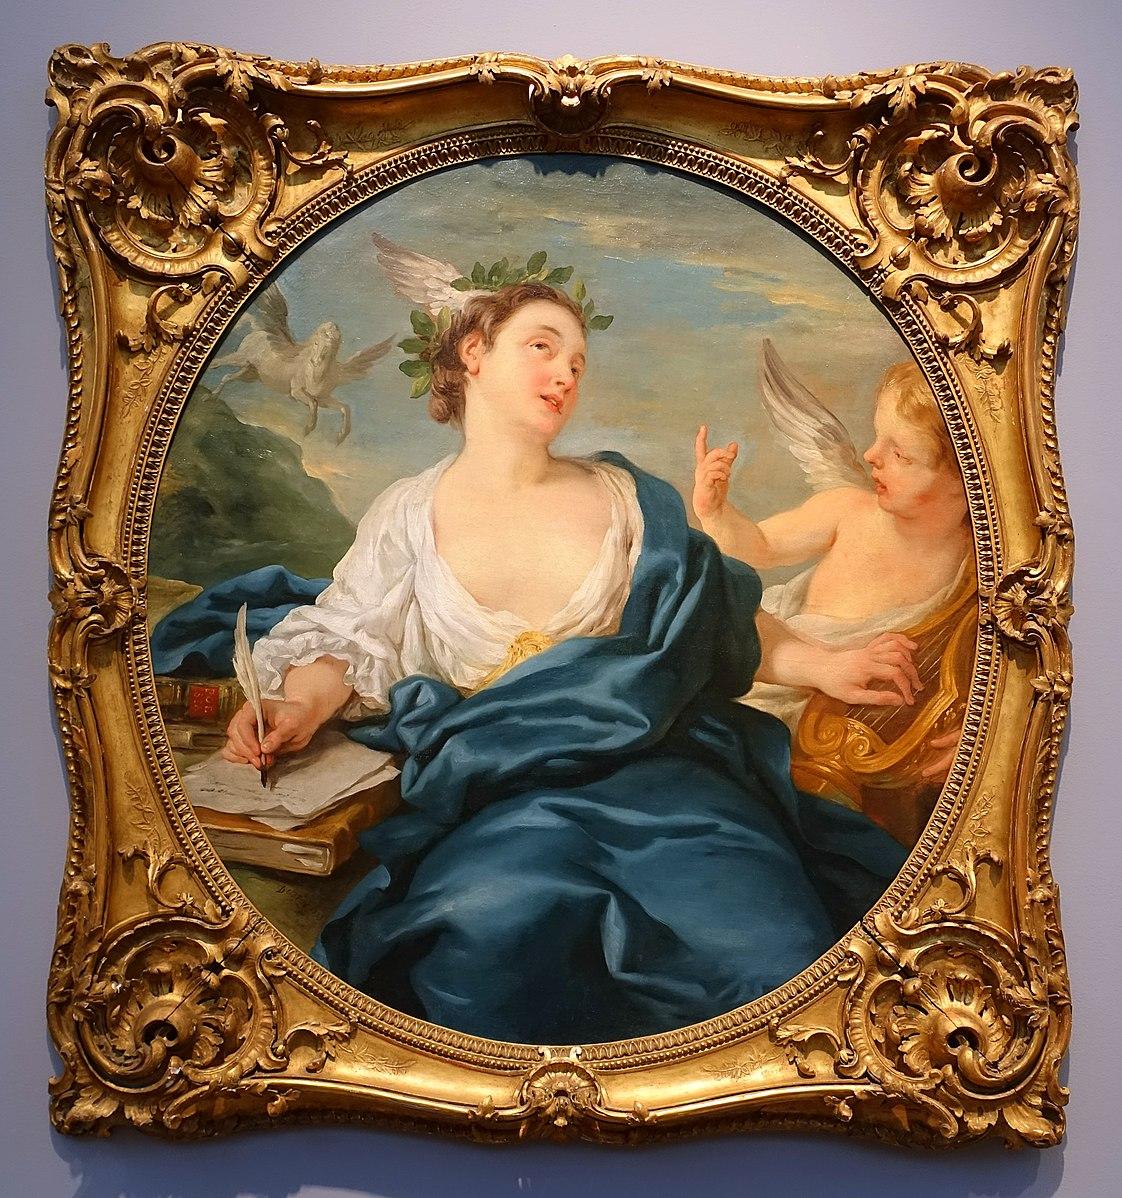 De Troy 1733 Allegorie de la Poesie Portland Museum